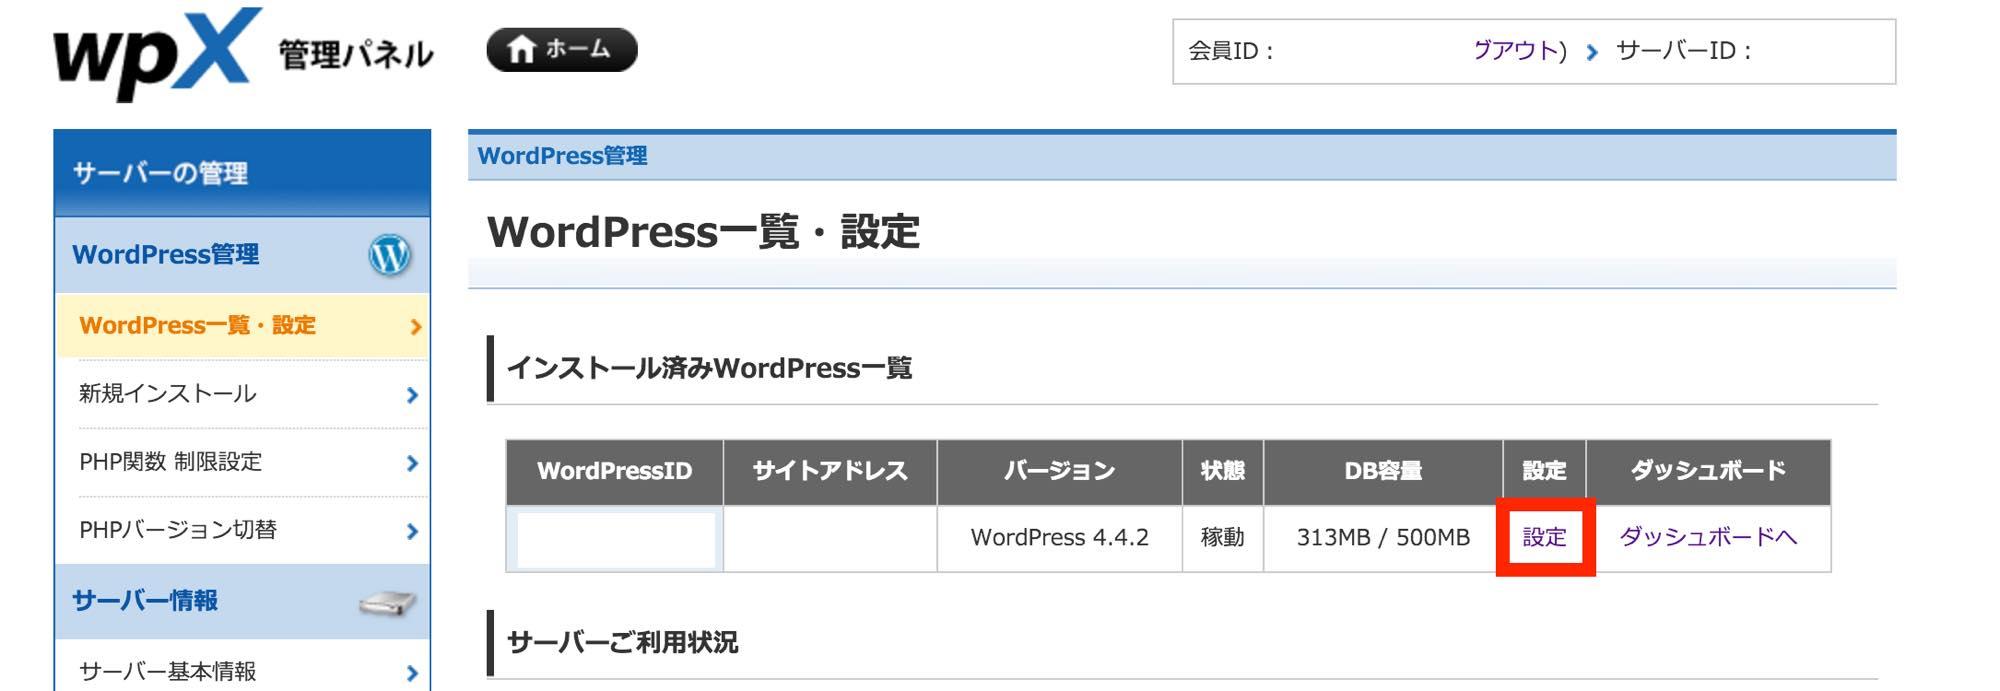 wpx-push7-error5